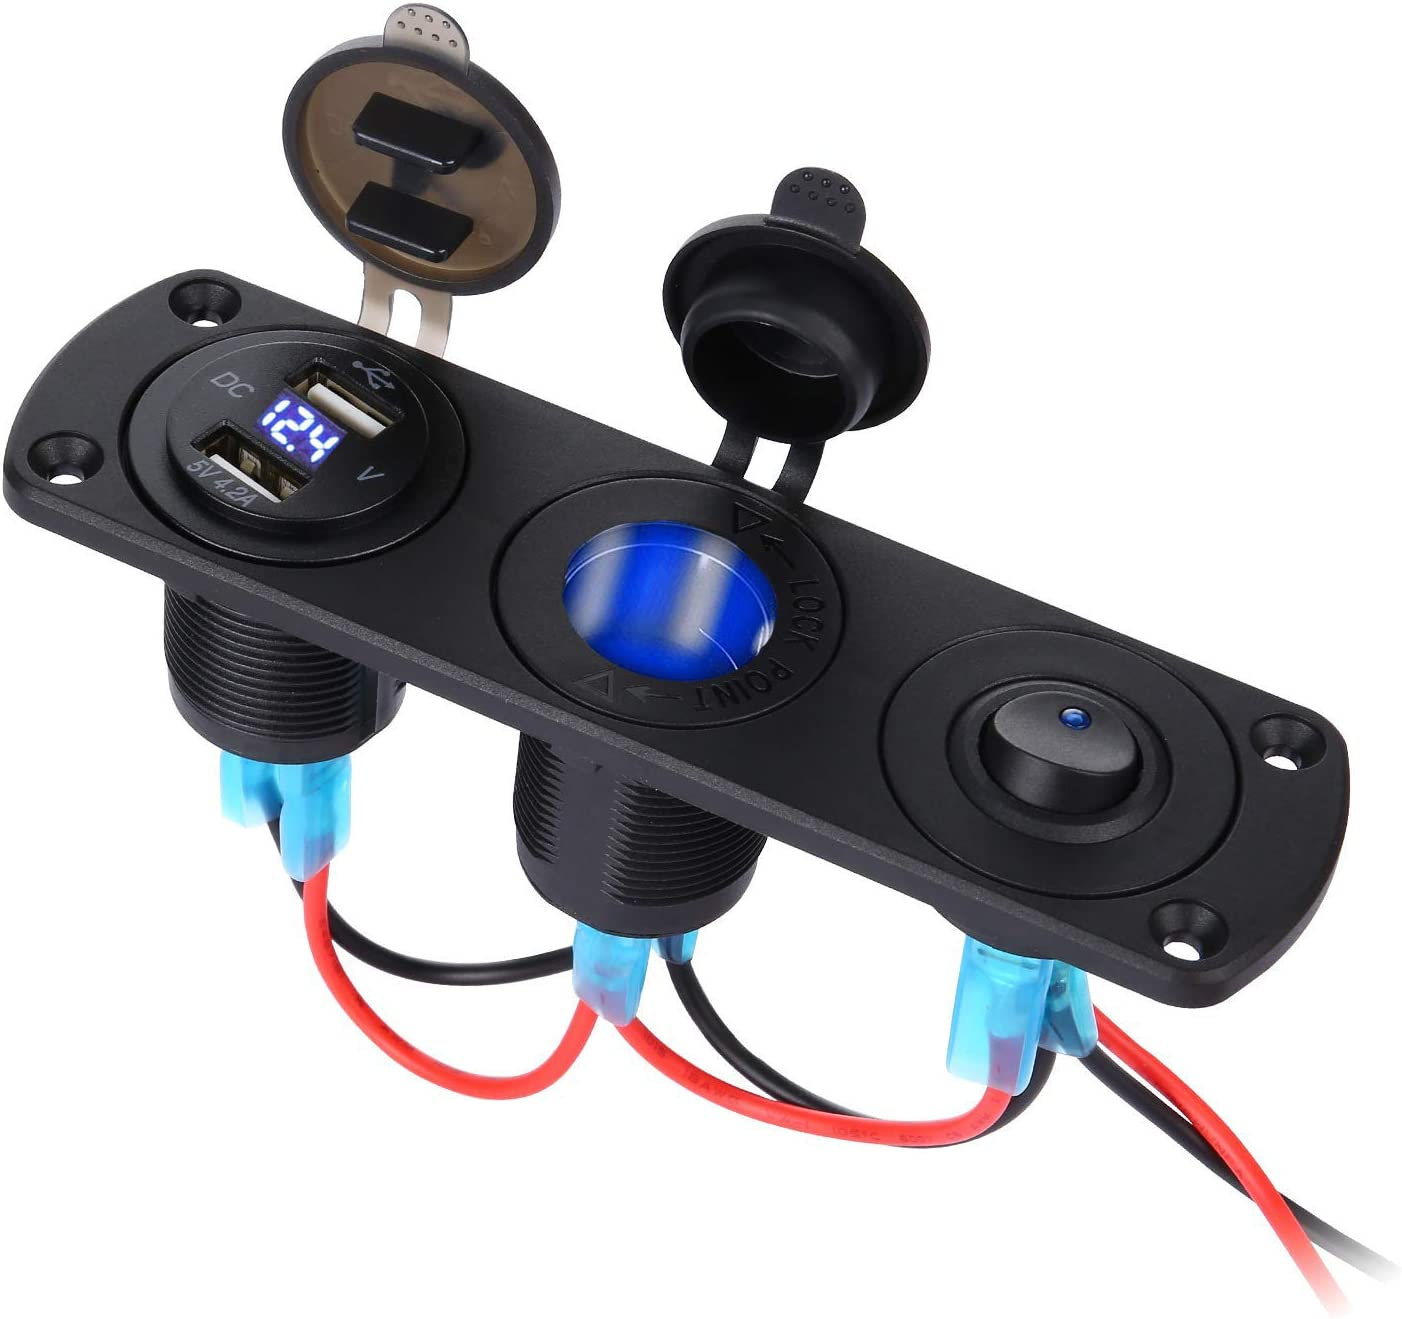 Thlevel USB de Cargador Coche Panel de Enchufes 12V / 24V 36W, Dual USB Cargador con Voltímetro Digital LED y Encendedor de Cigarrillos y LED Azul Interruptor, para Coche, Marina, Barco, Camión